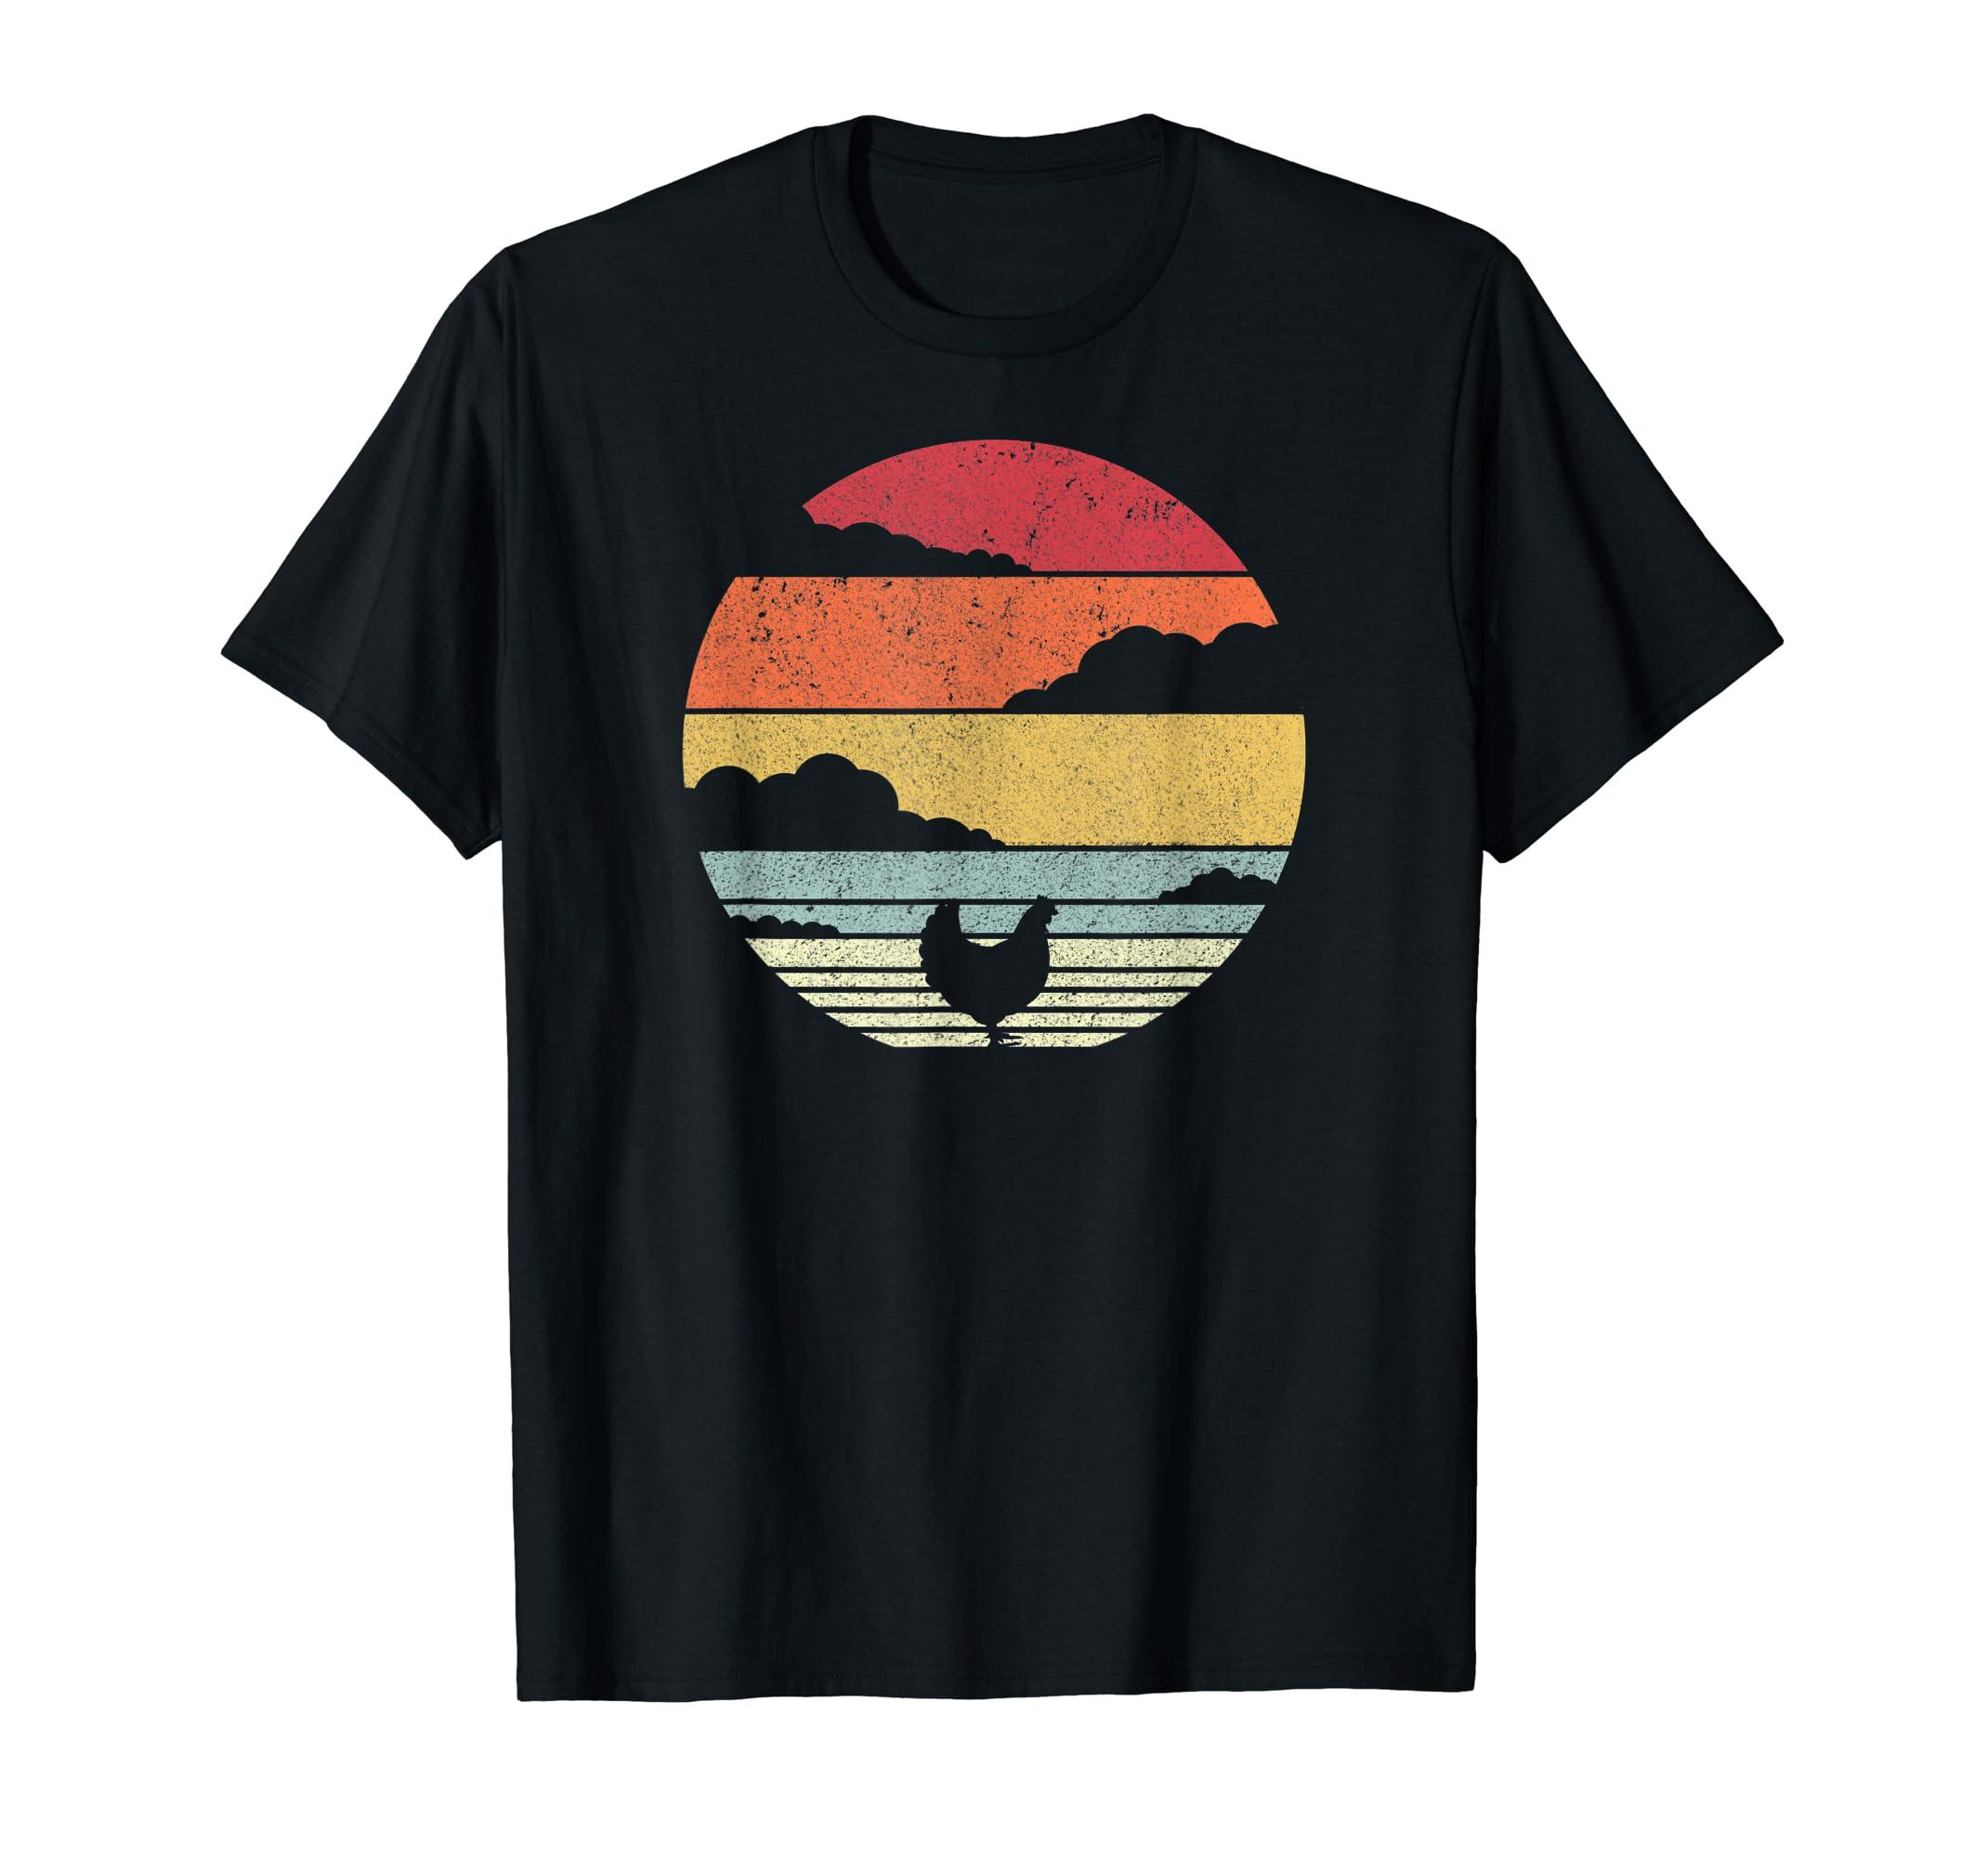 Chicken Shirt. Retro Style T-Shirt-Men's T-Shirt-Black